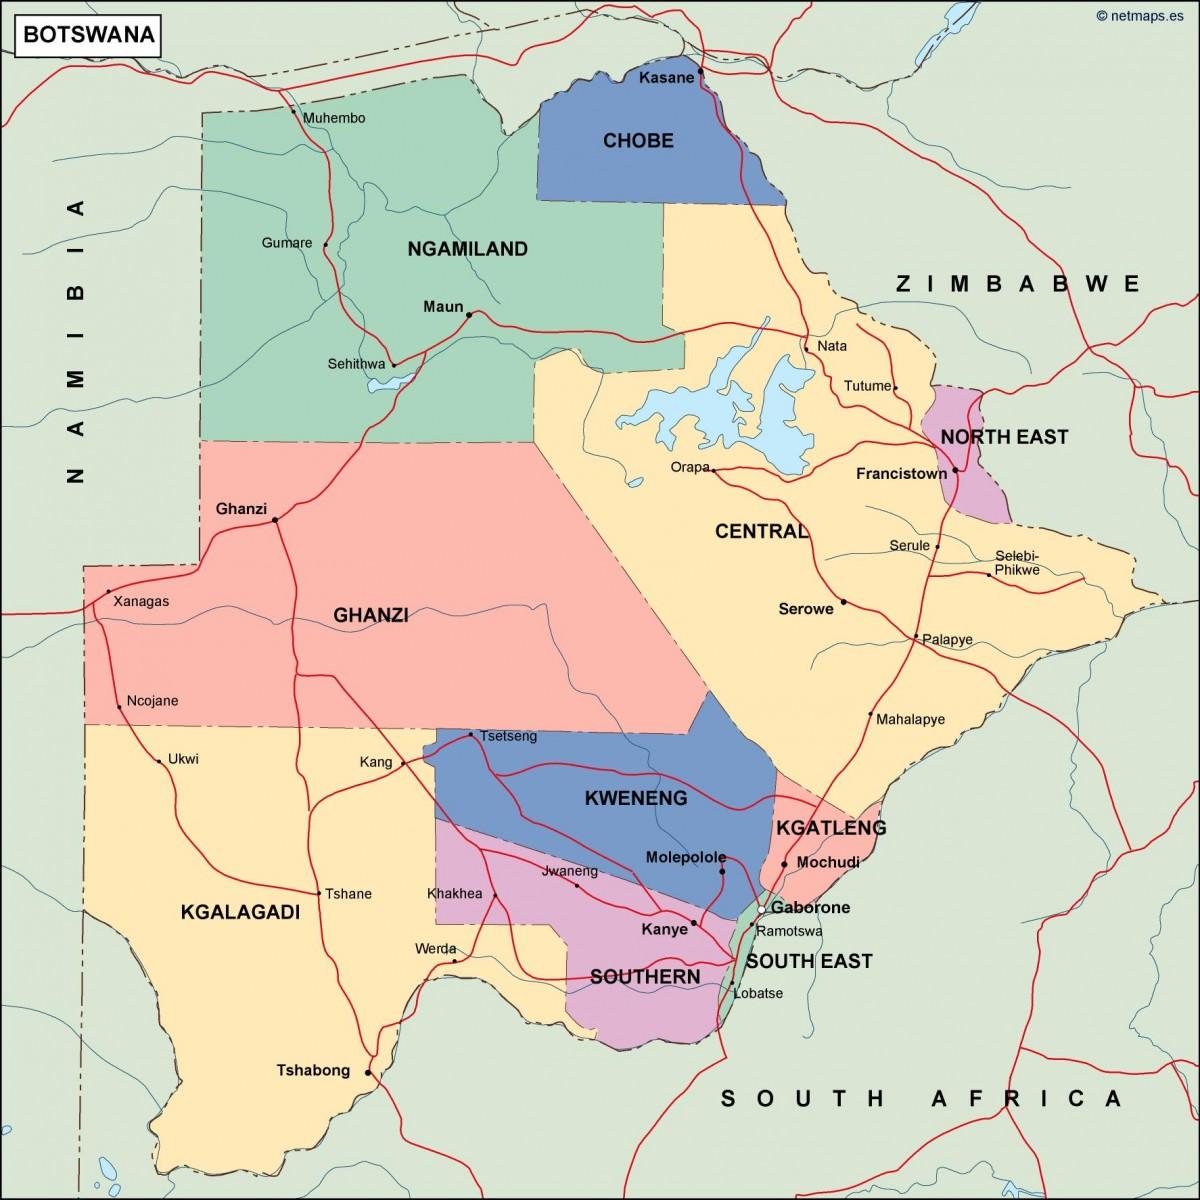 Botswana Political Map.Botswana Political Map Vector Eps Maps Eps Illustrator Map